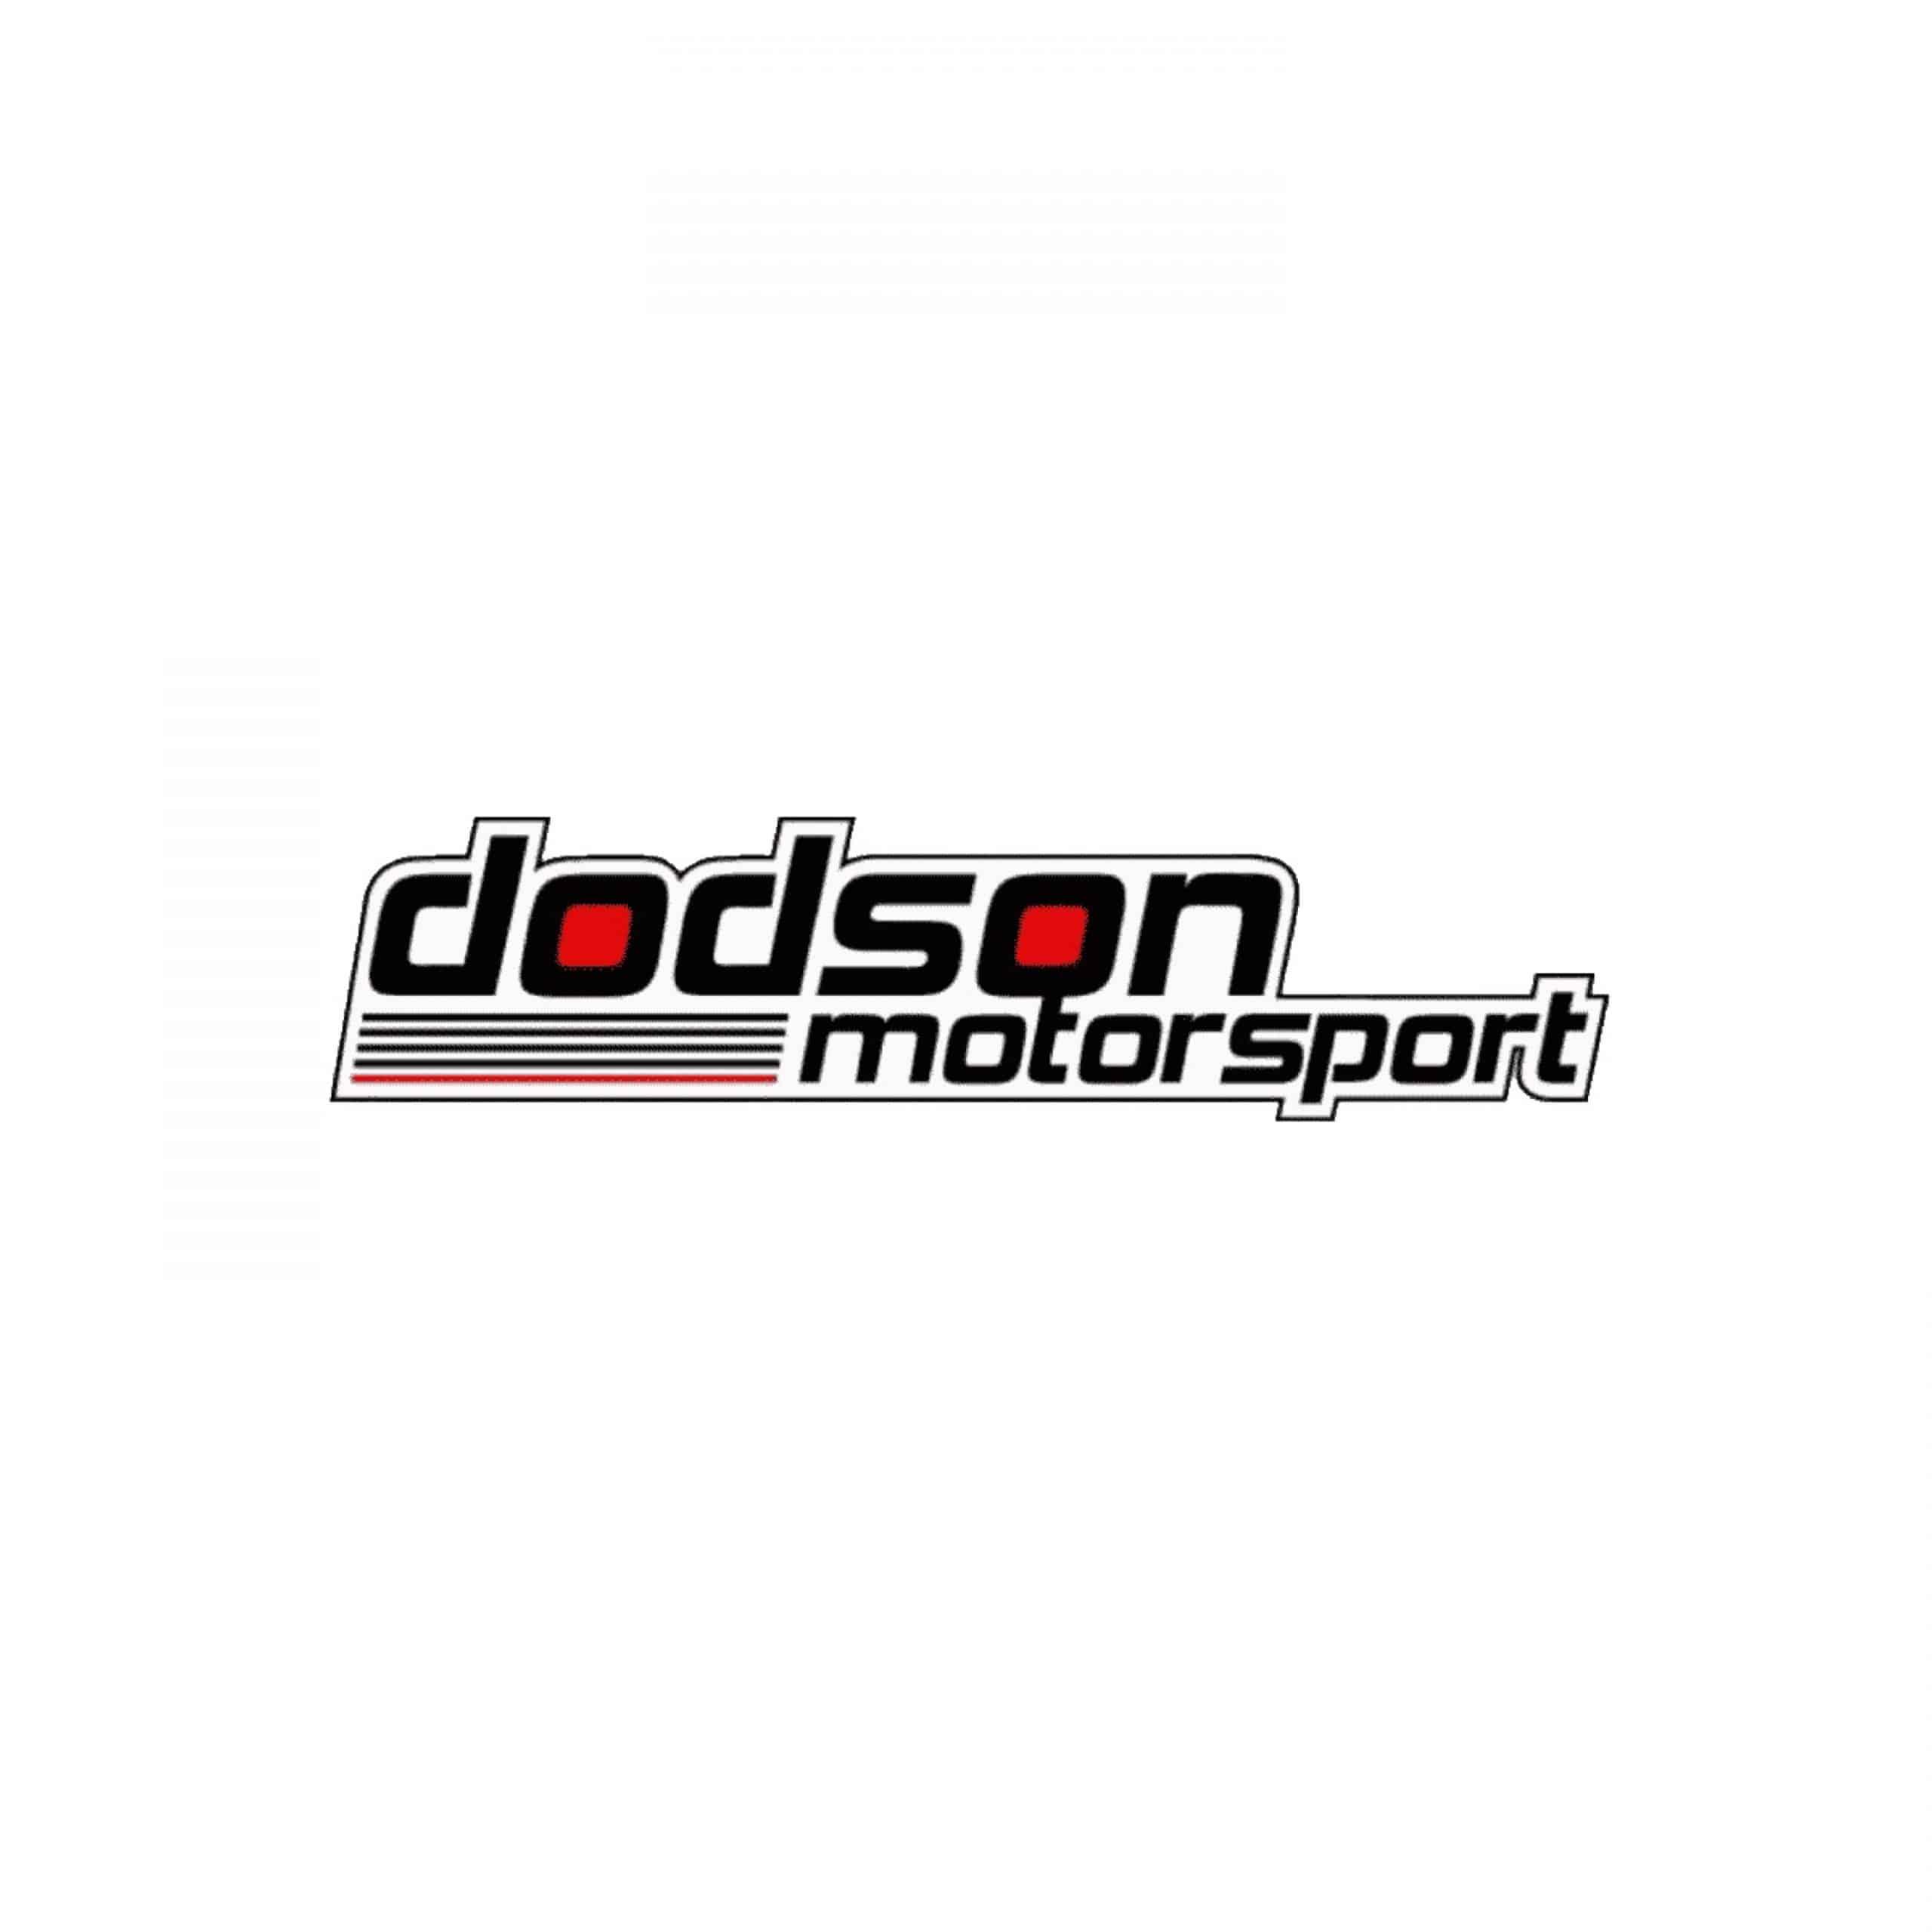 Dodson Motorsports